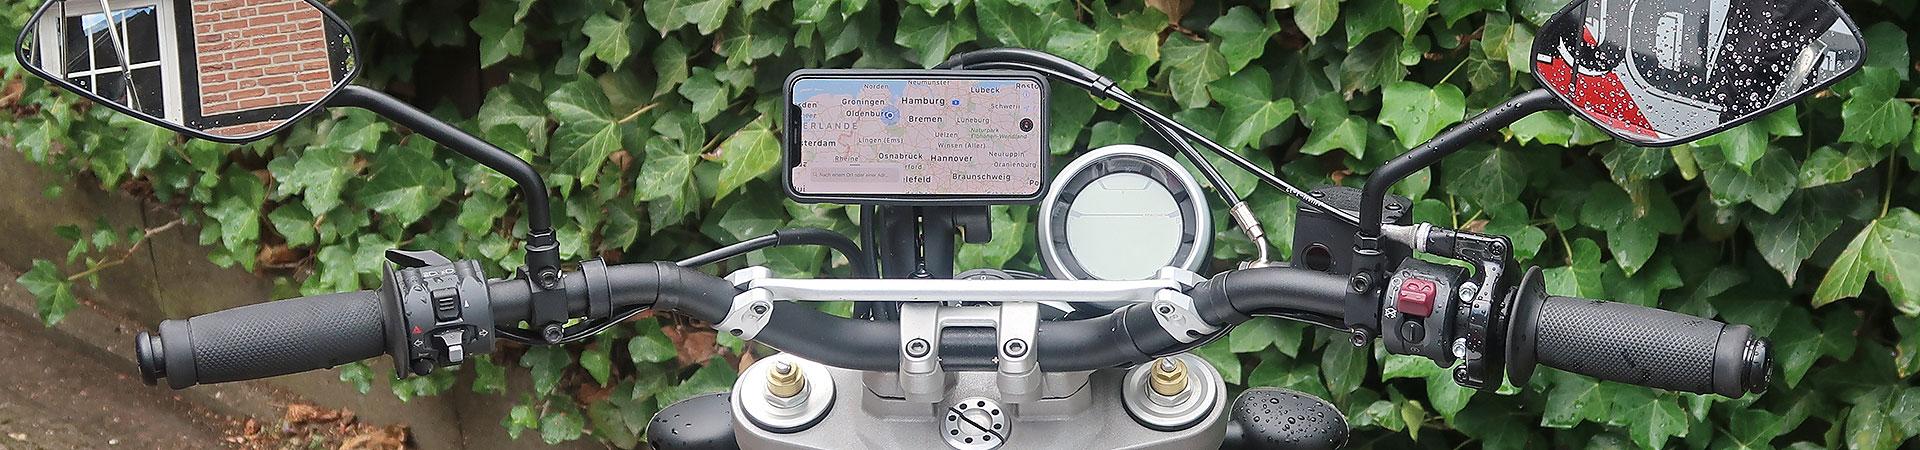 Smartphone am Motorrad